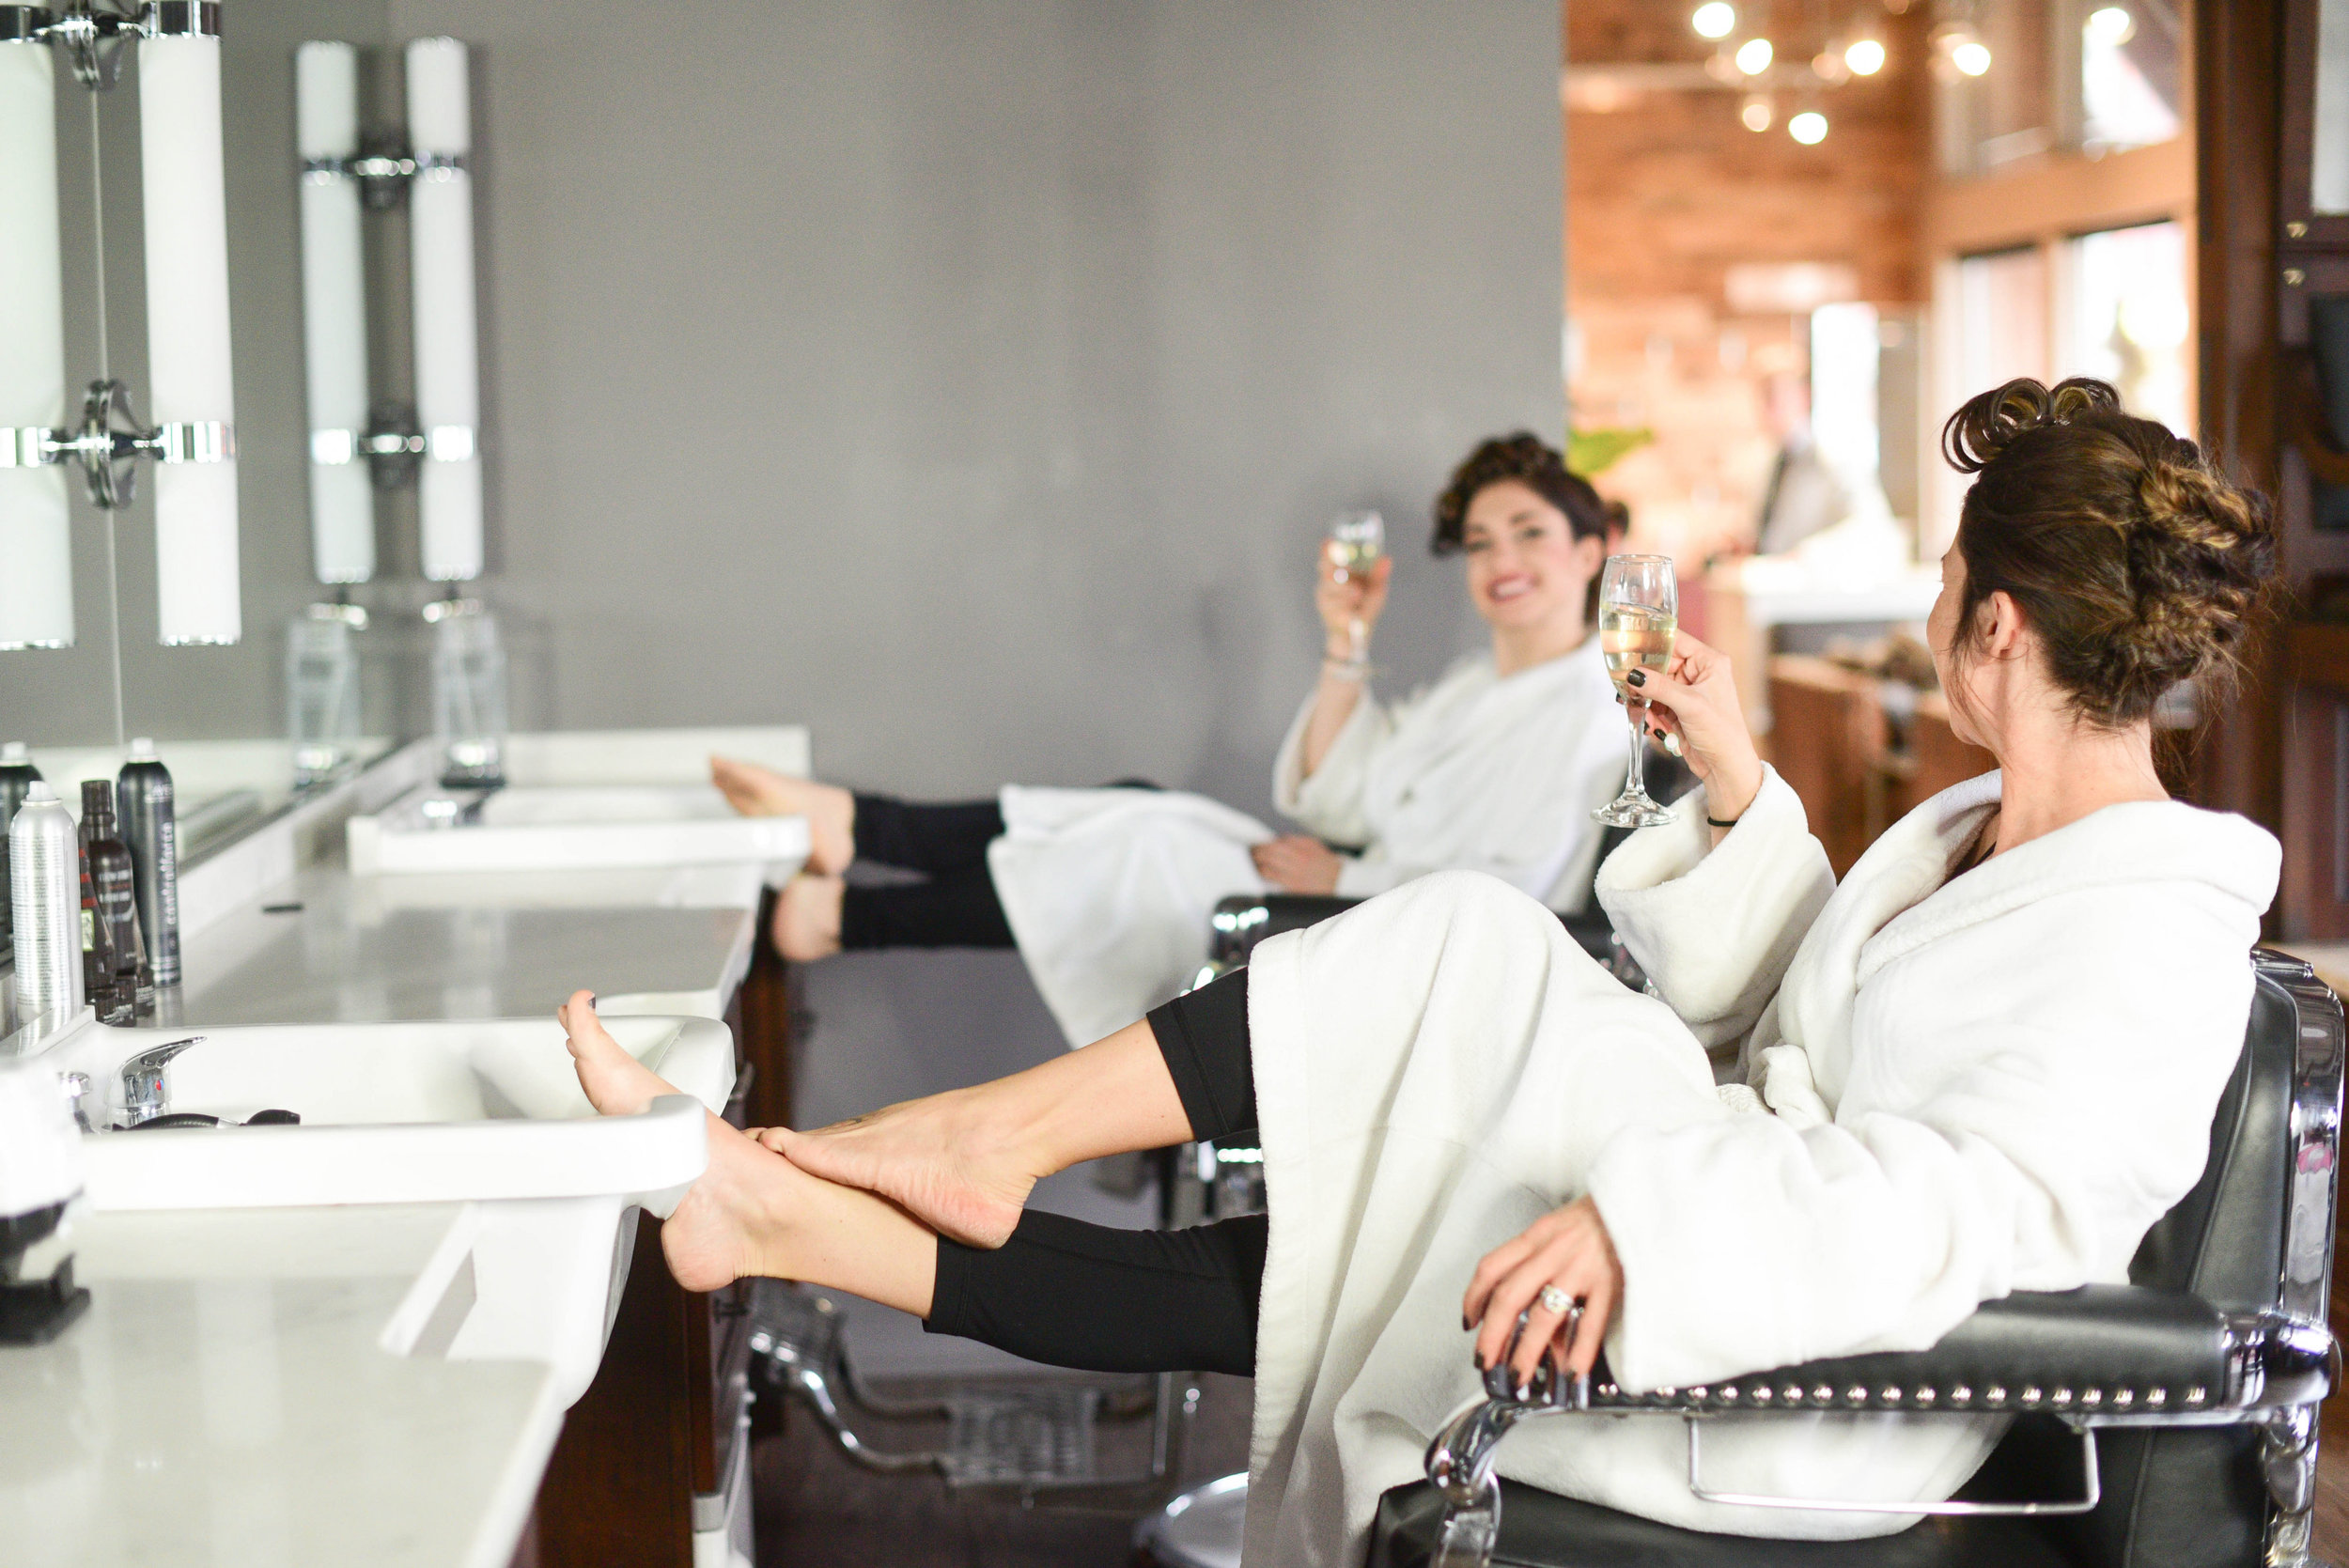 Nail Services - Express Pedicure $33+Classic Pedicure $44+Spa Pedicure $55+Gel Pedicure $59+